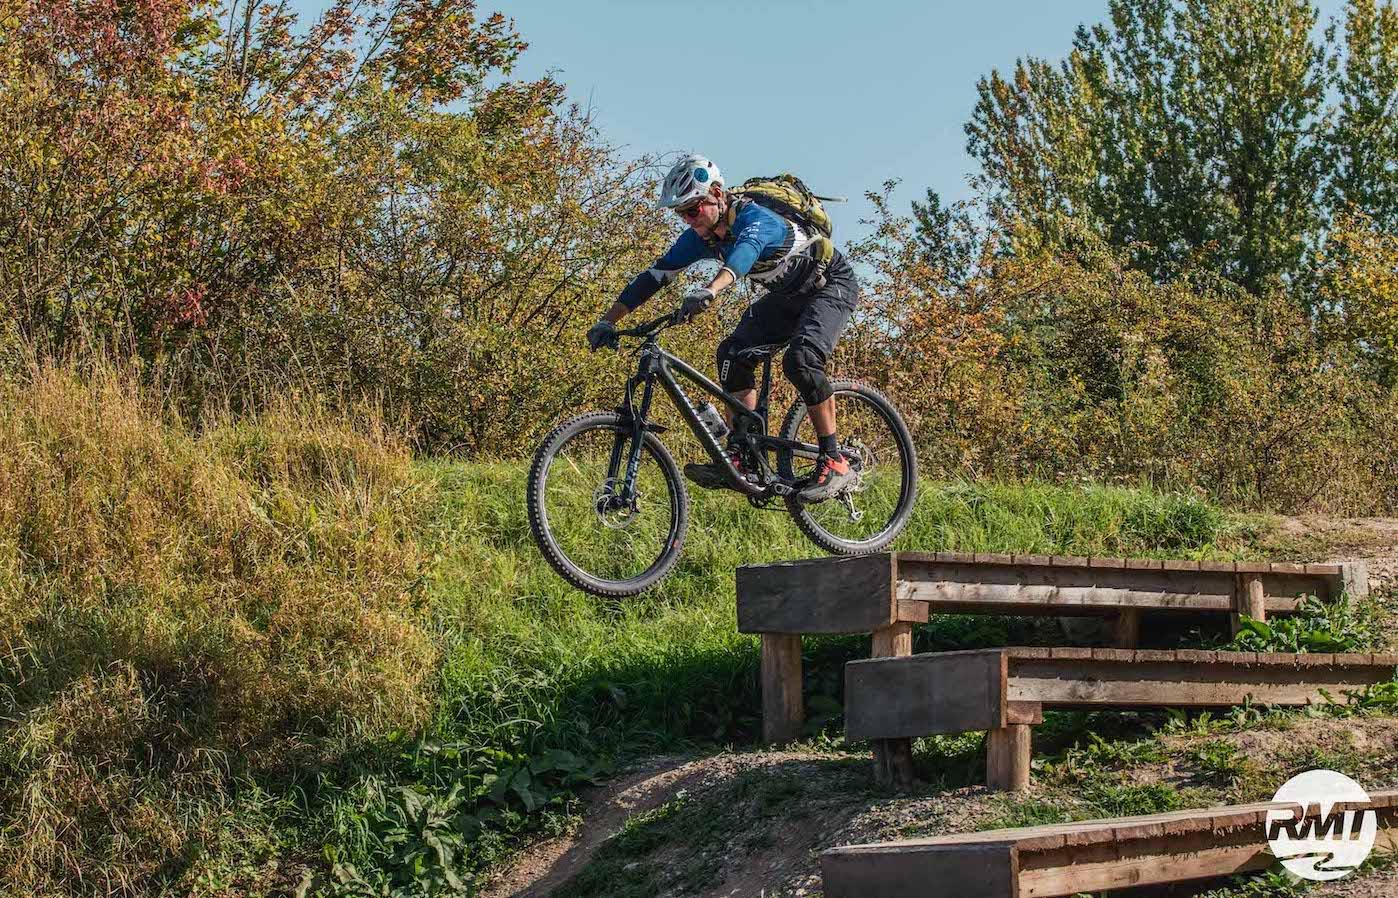 MTB Sprung & Drop Kurs im Trailpark Erbeskopf - Fahrtechnik Training Rock my Trail Bikeschule - 15